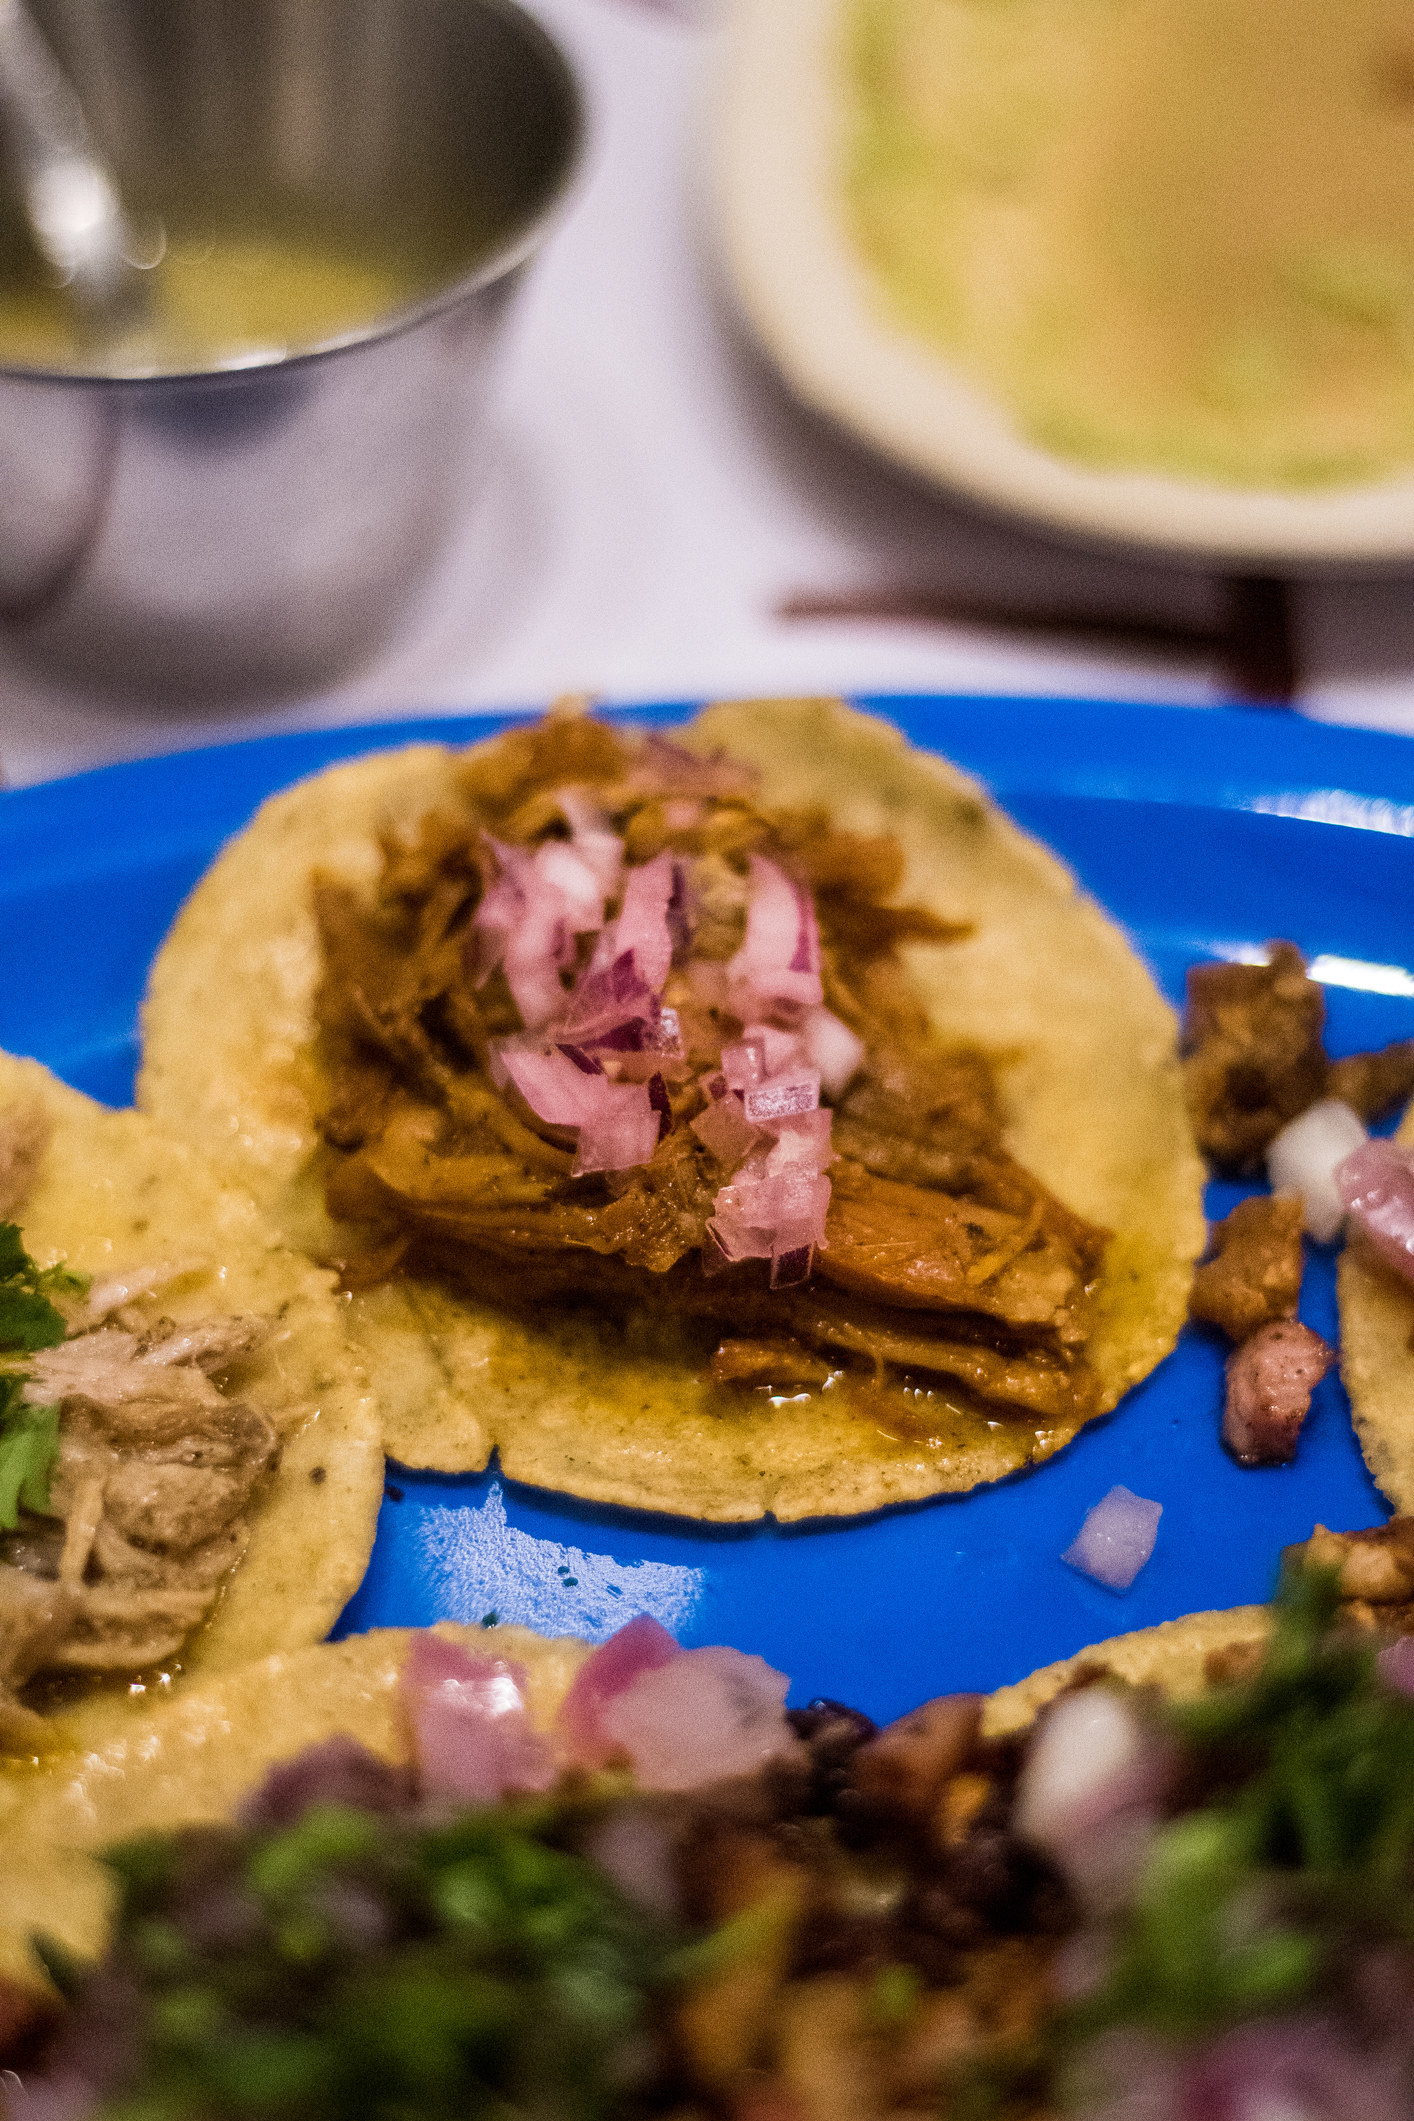 Conchita pibil tacos.